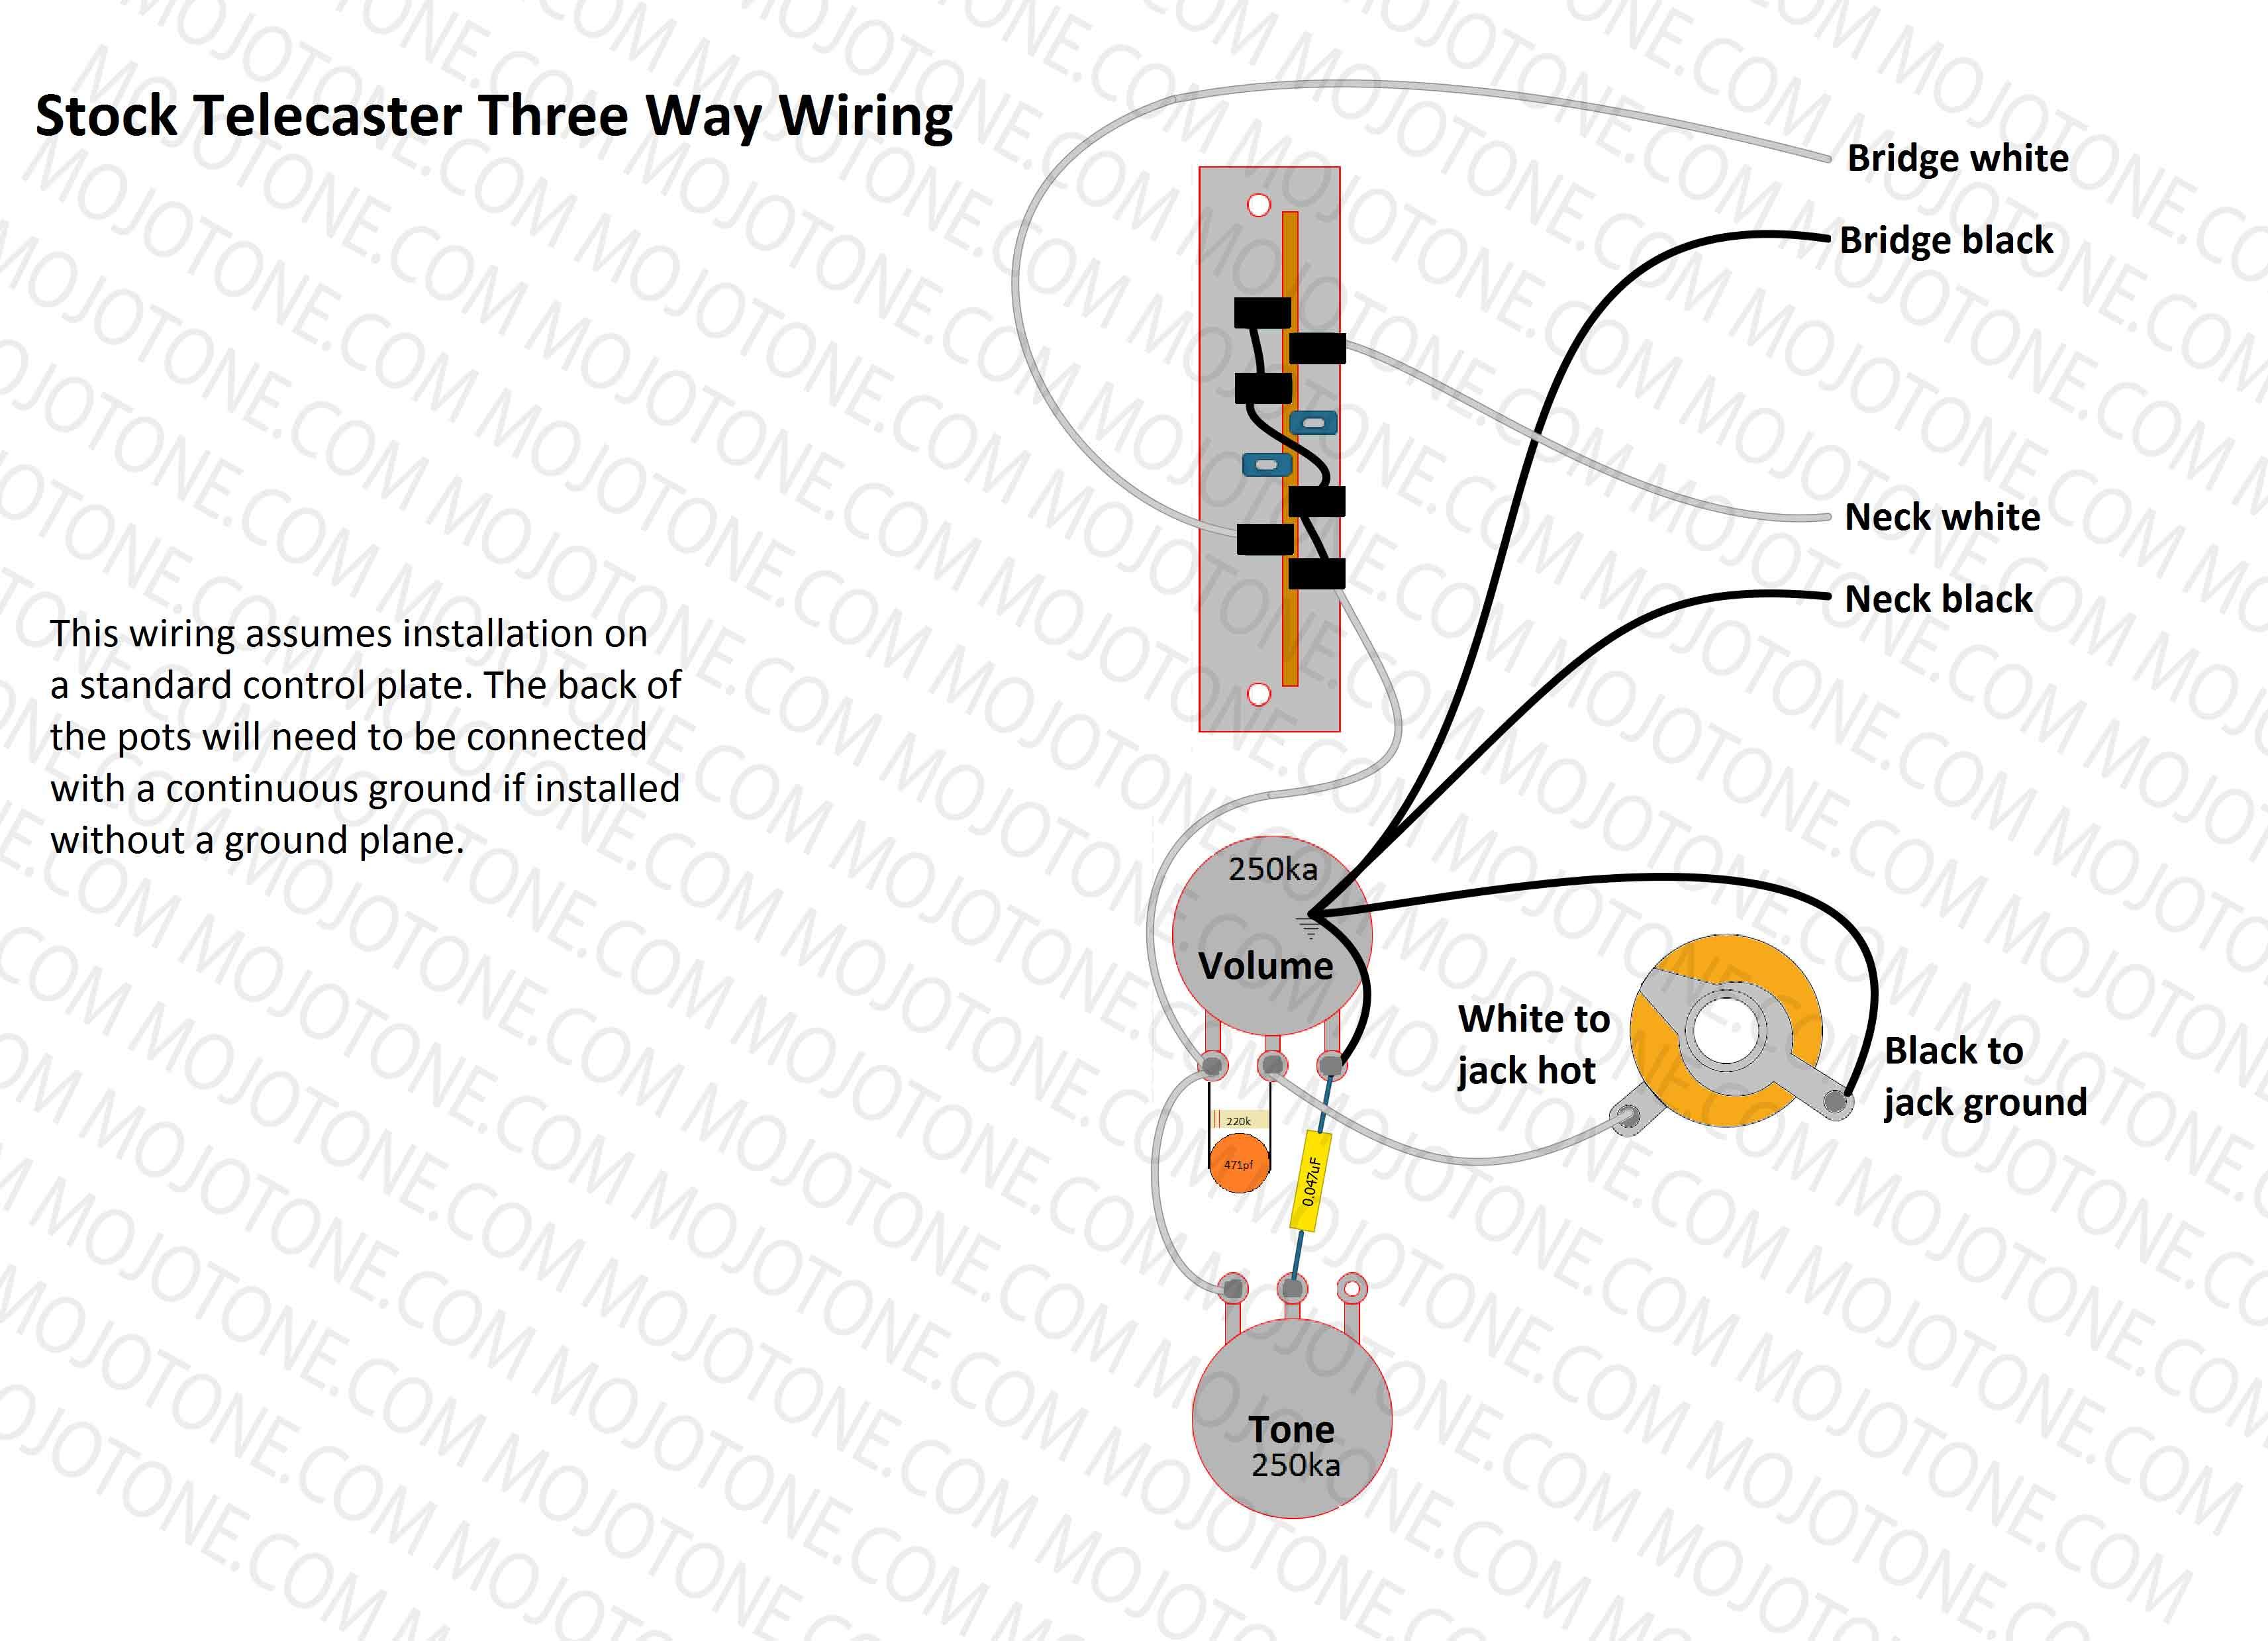 Telecaster Wiring Diagram 3 Way Switch | Schematic Diagram - Toggle Switch Wiring Diagram